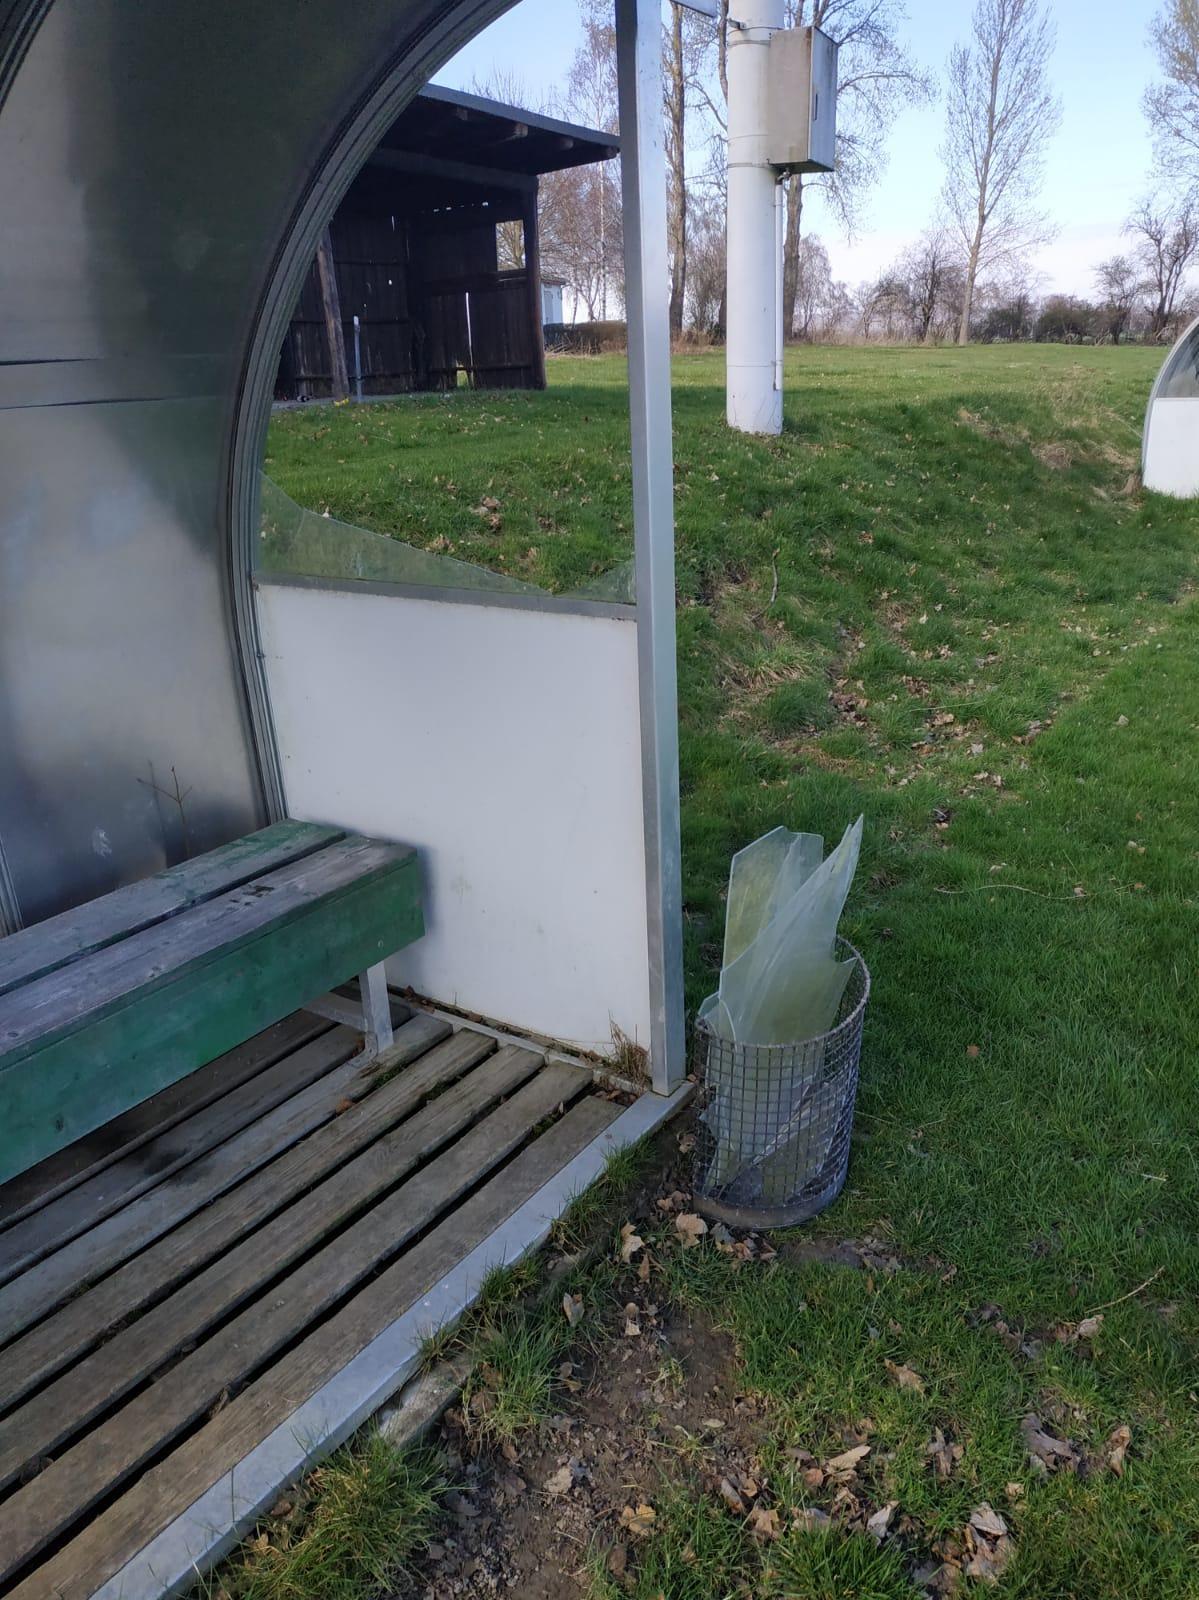 Randale auf Sportplatz des VfB Dörnten